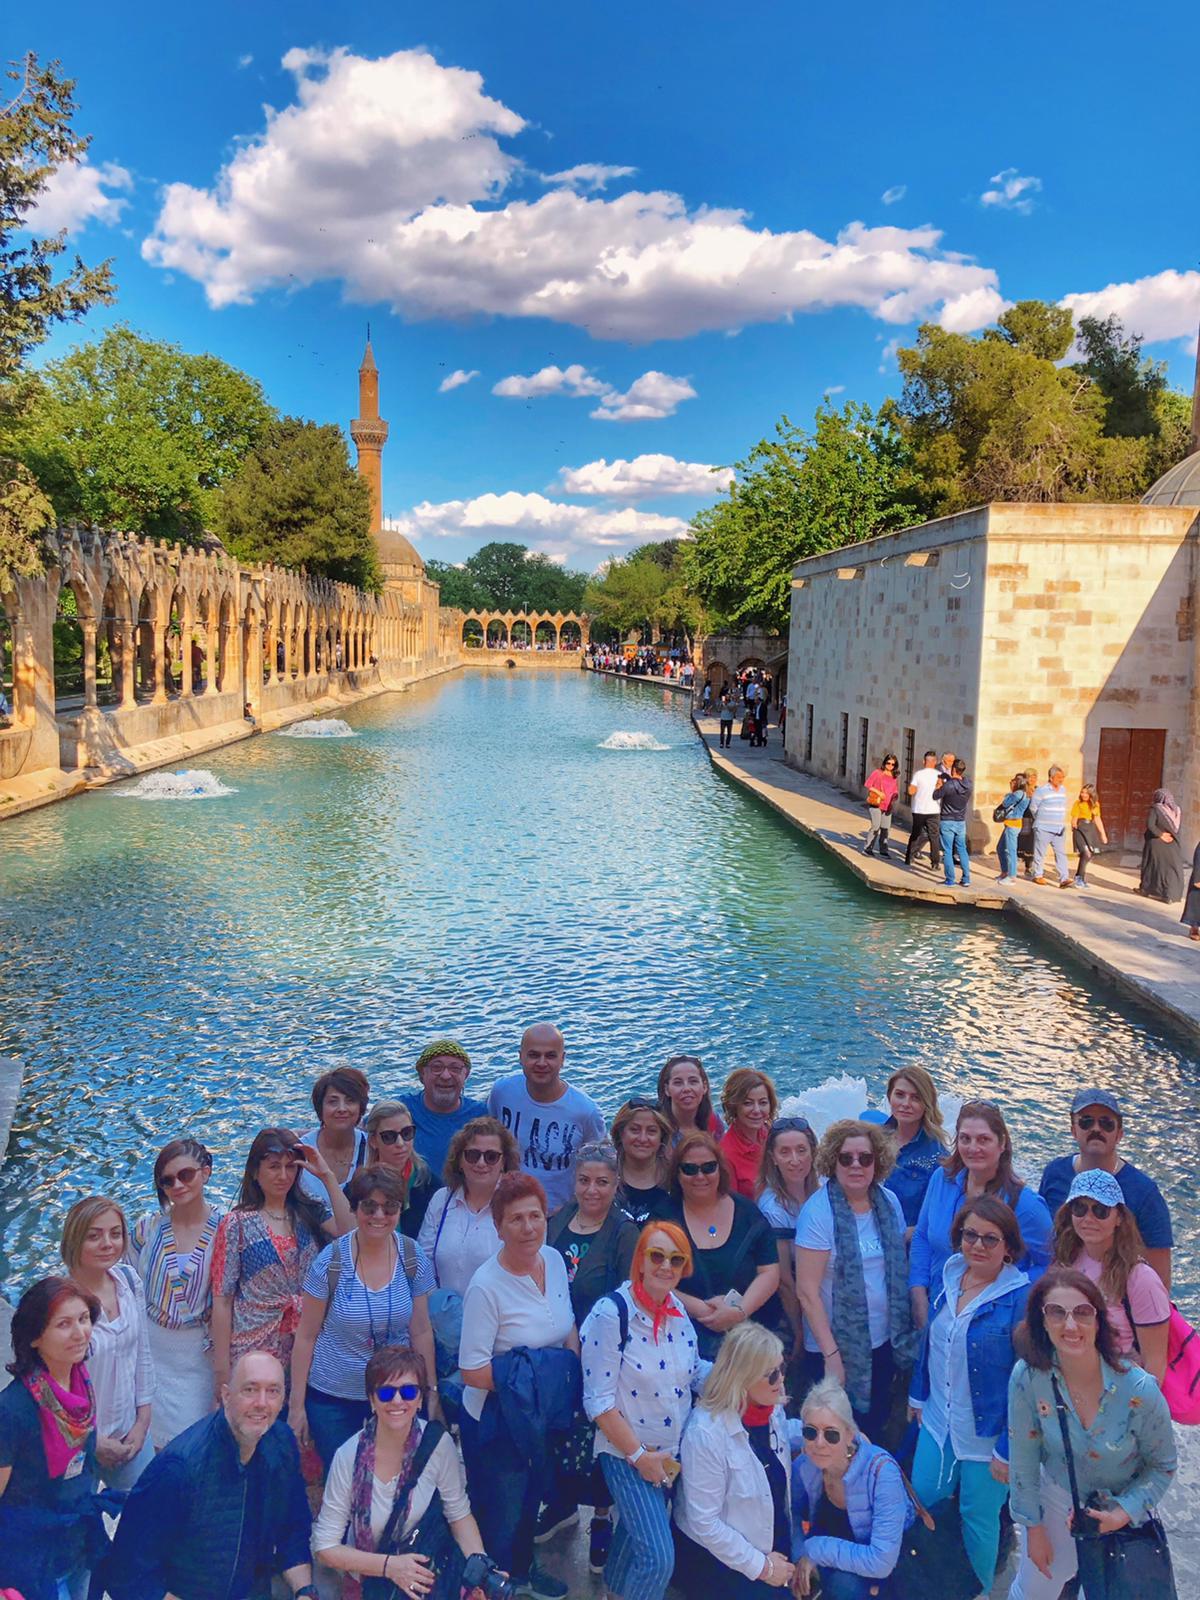 Pool of Abraham